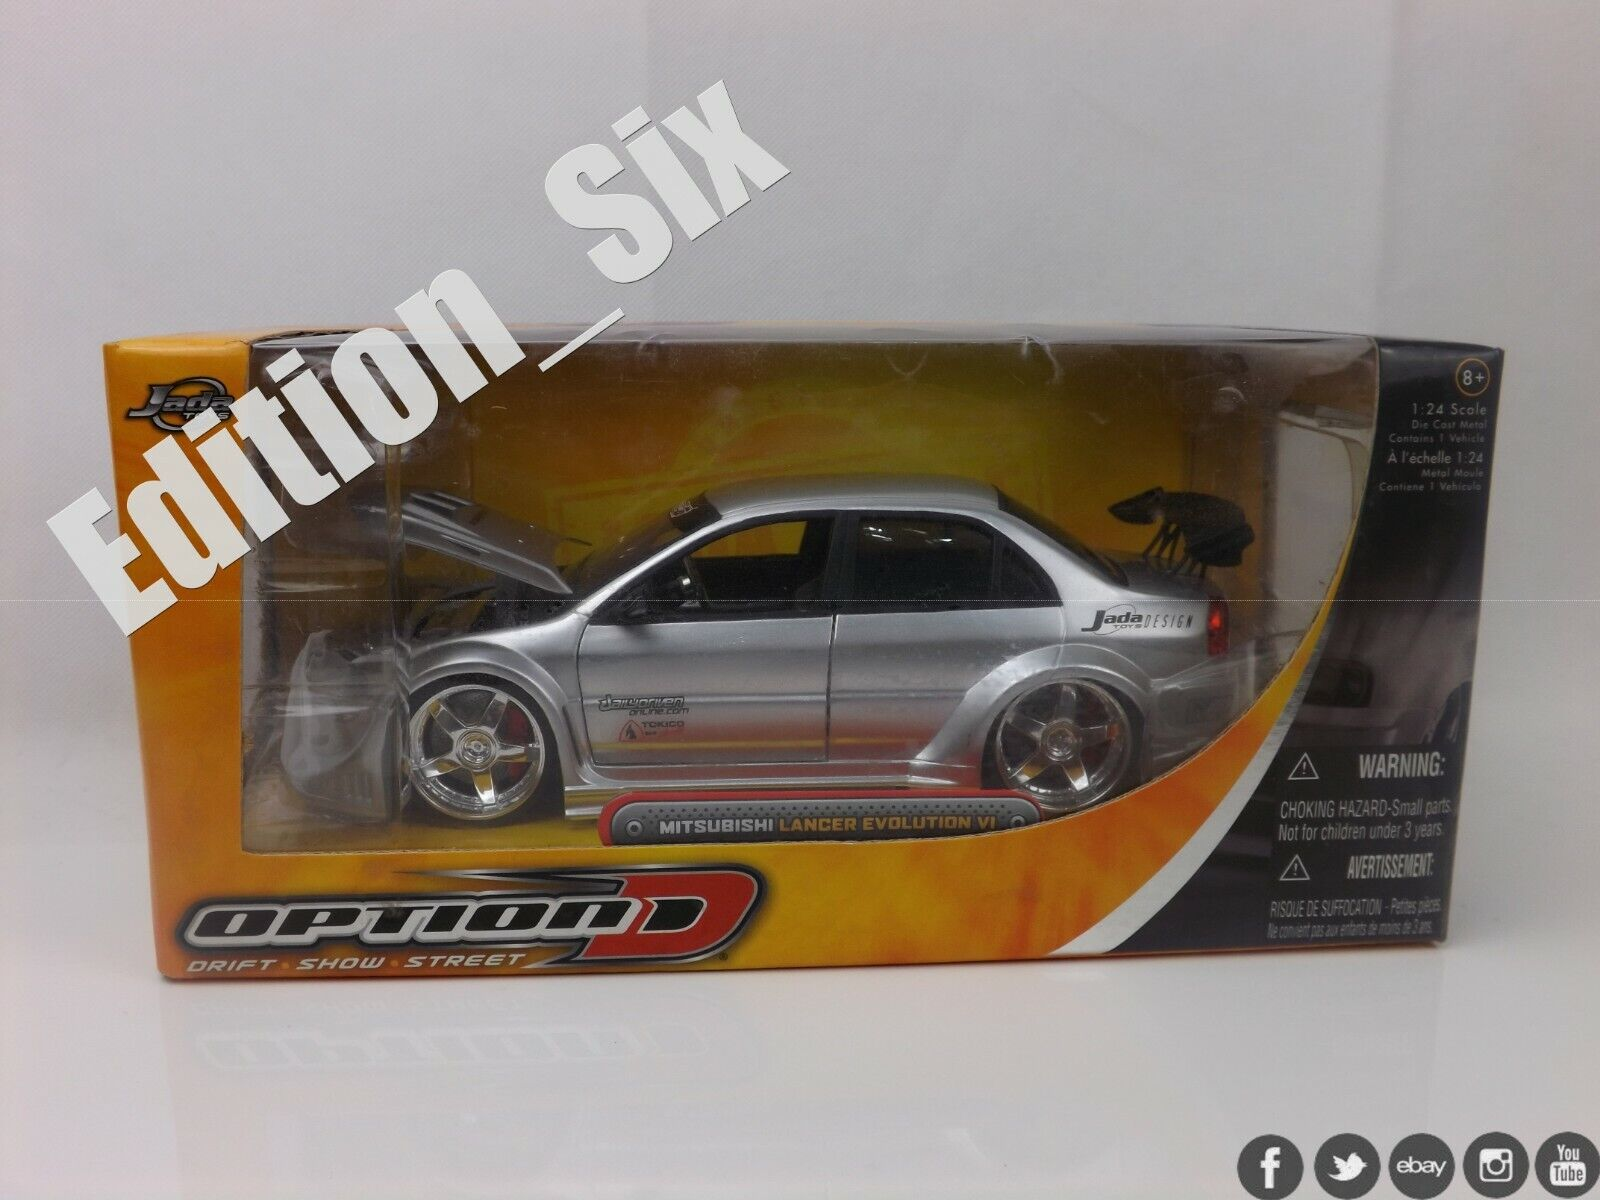 Jada Toys 1 24 Mitsubishi Lancer Evolution Evo VI 6 Modified JDM Sport car box